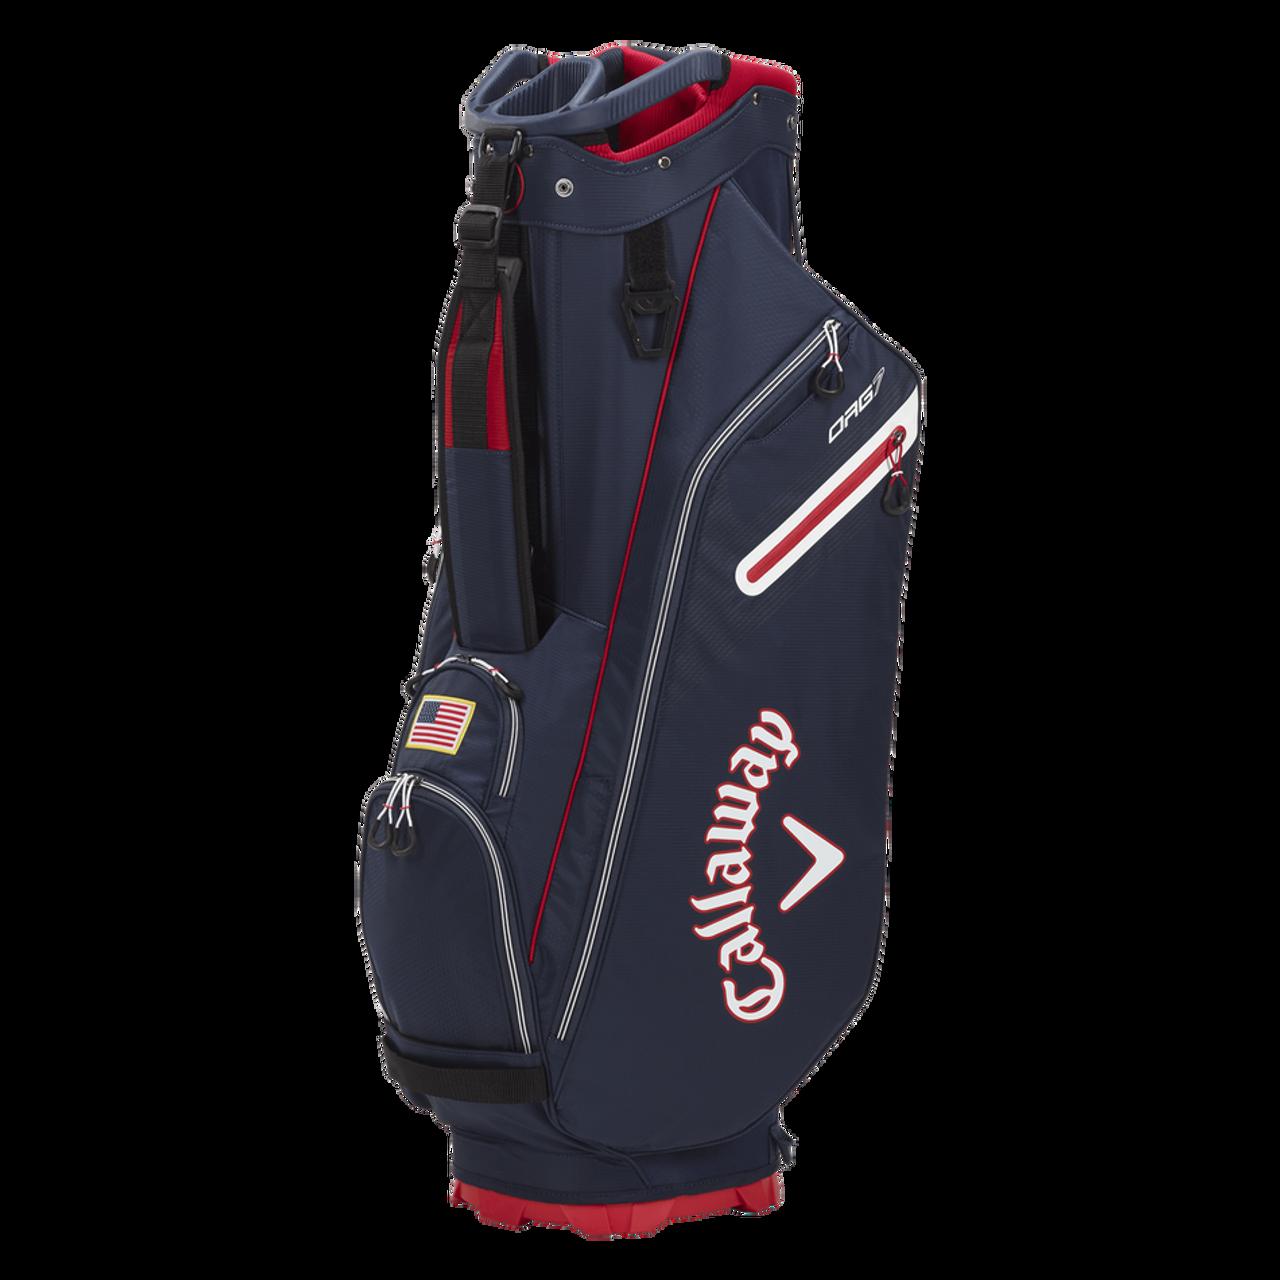 Callaway Org 7 Cart Bag 2021 - Navy / Red / White Flag